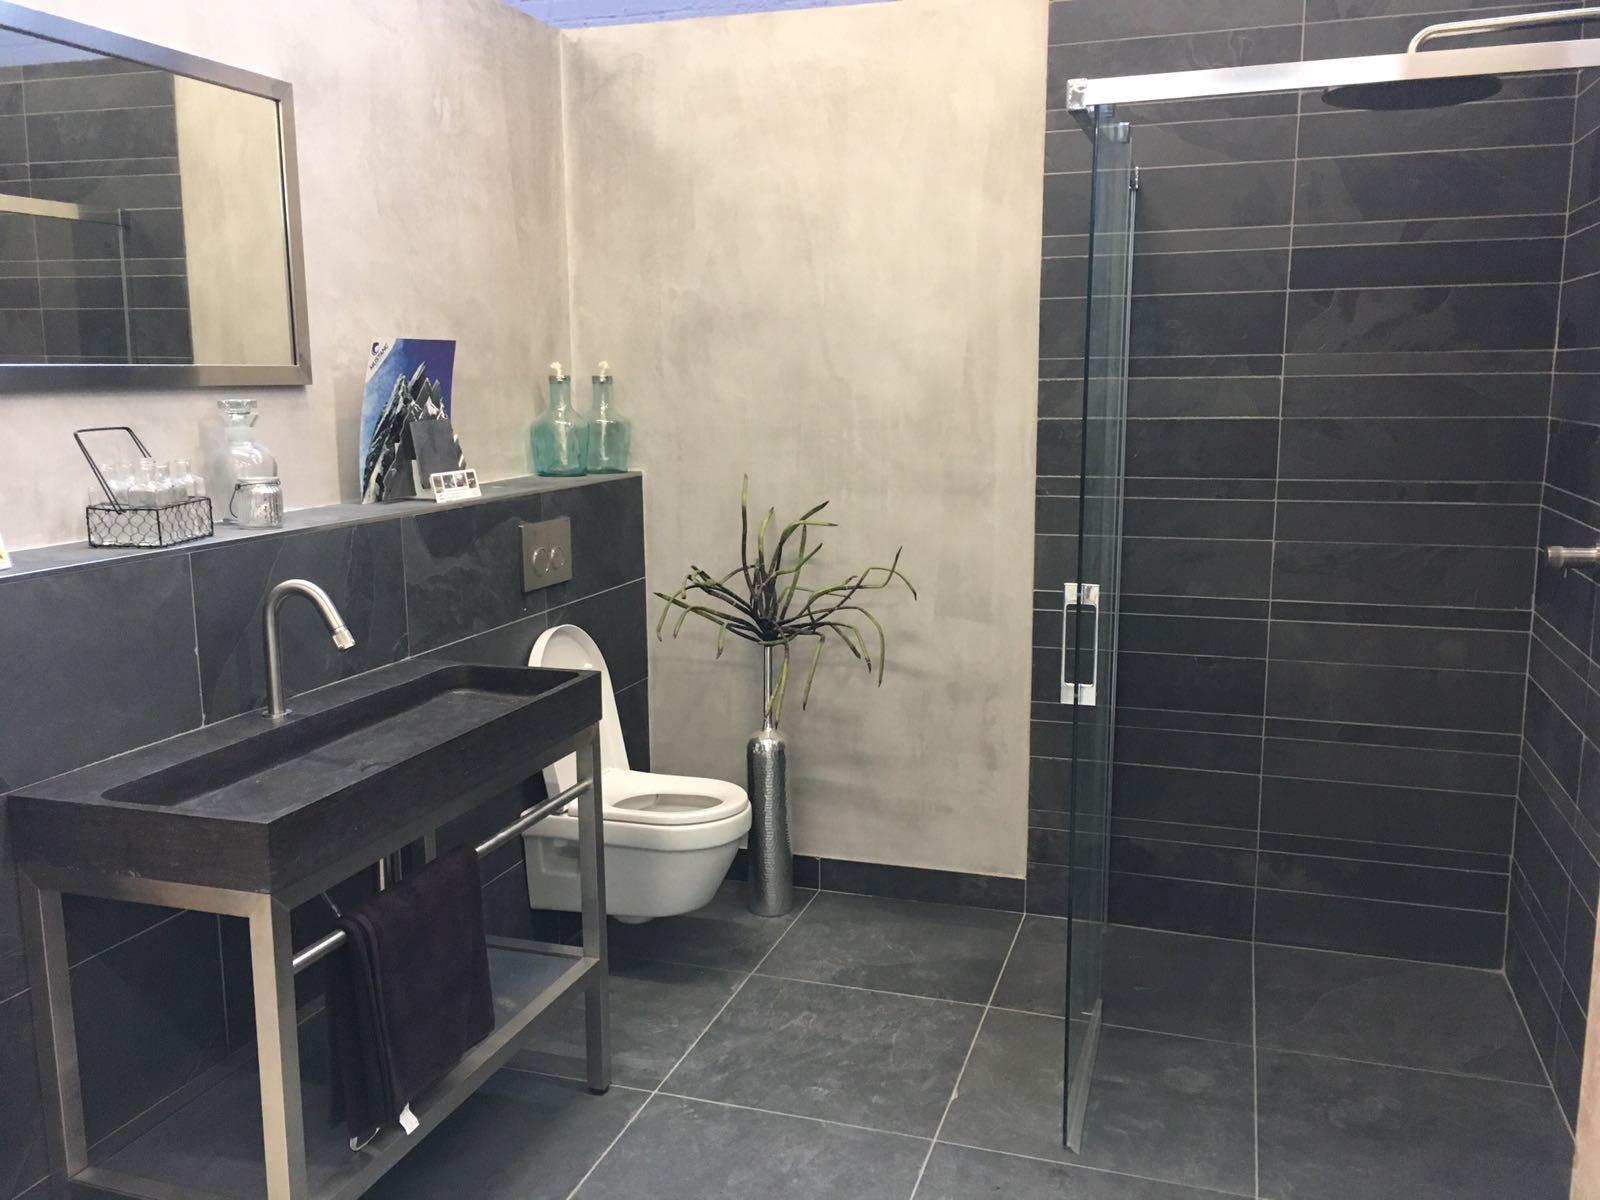 MEGA Tegels & Badkamers: dé badkamerspeciaalzaak